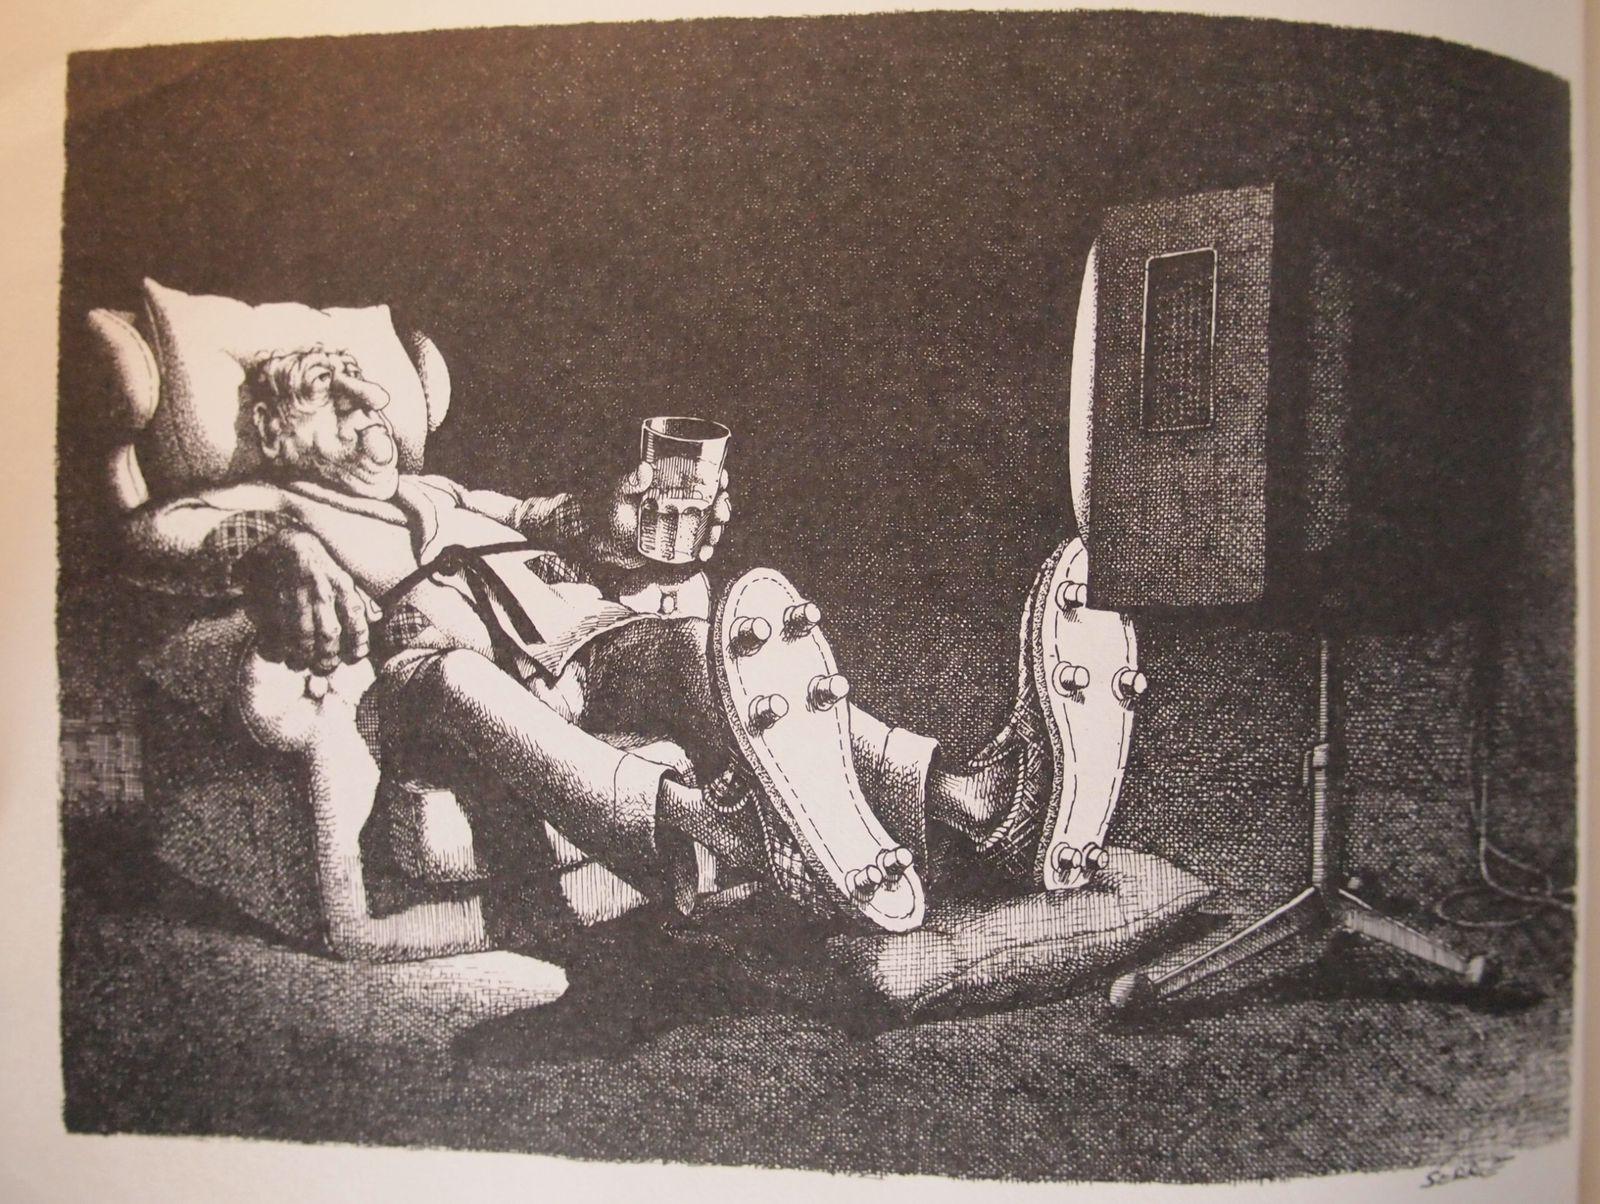 spectateur-crampons-television-football.JPG